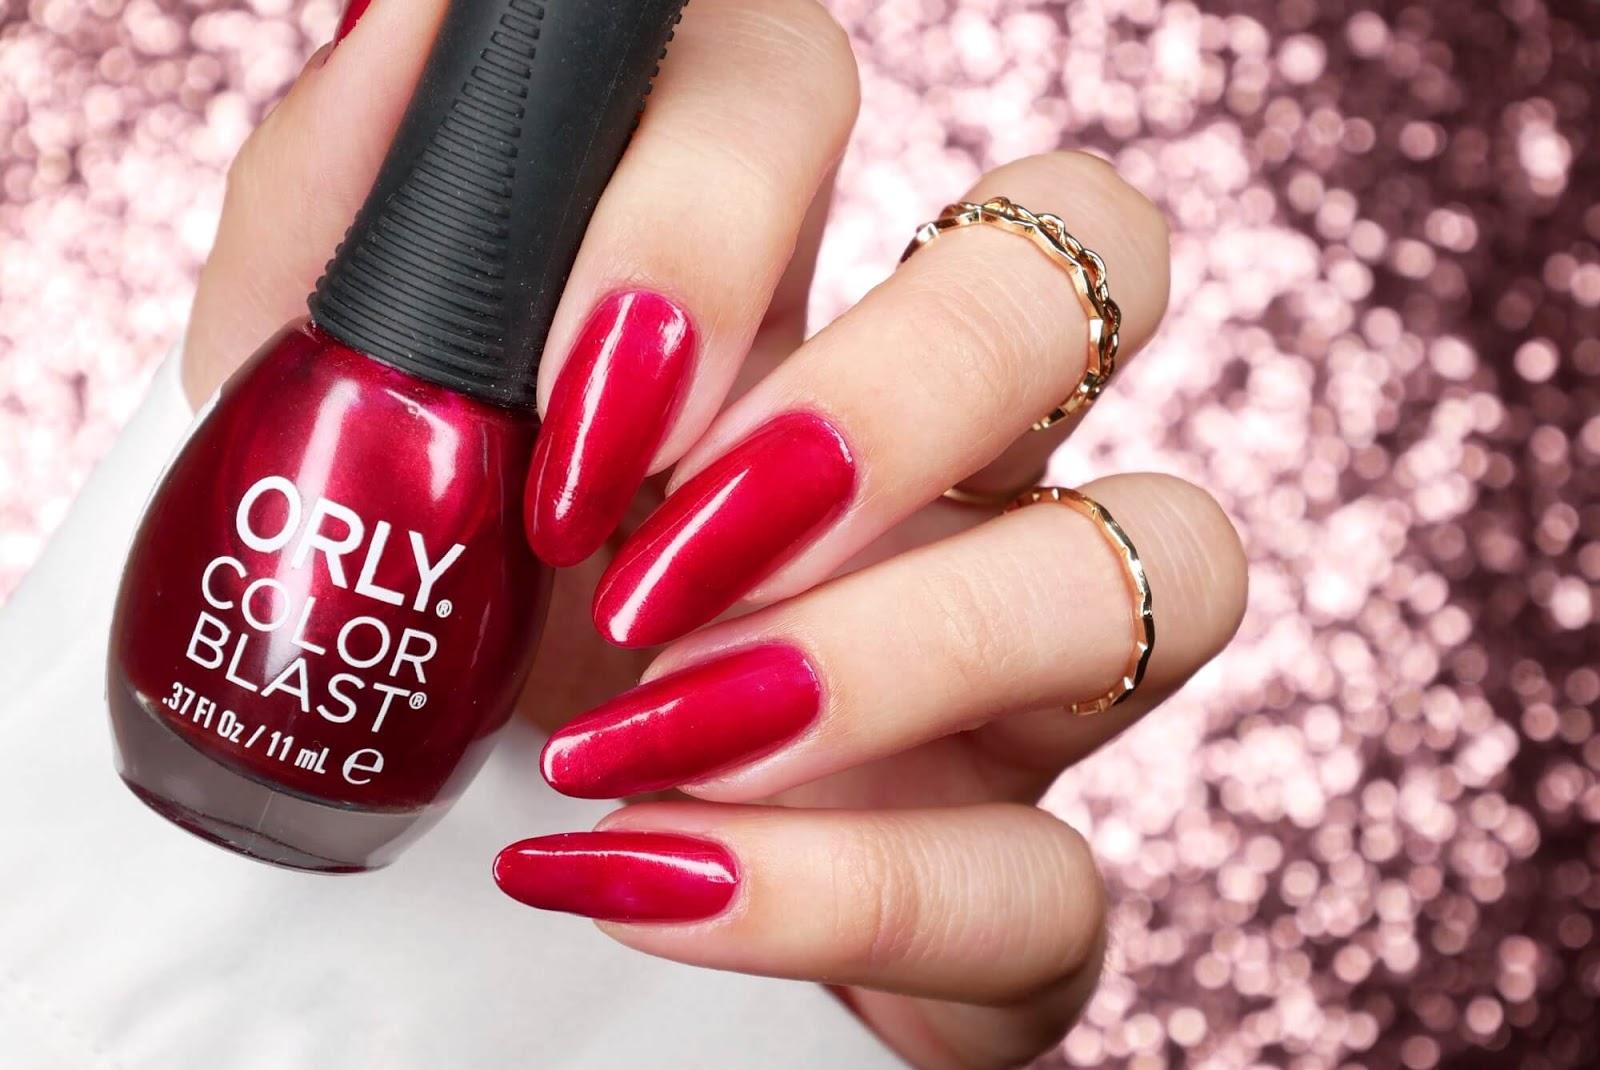 Orly color blast Garnet luxe shimmer